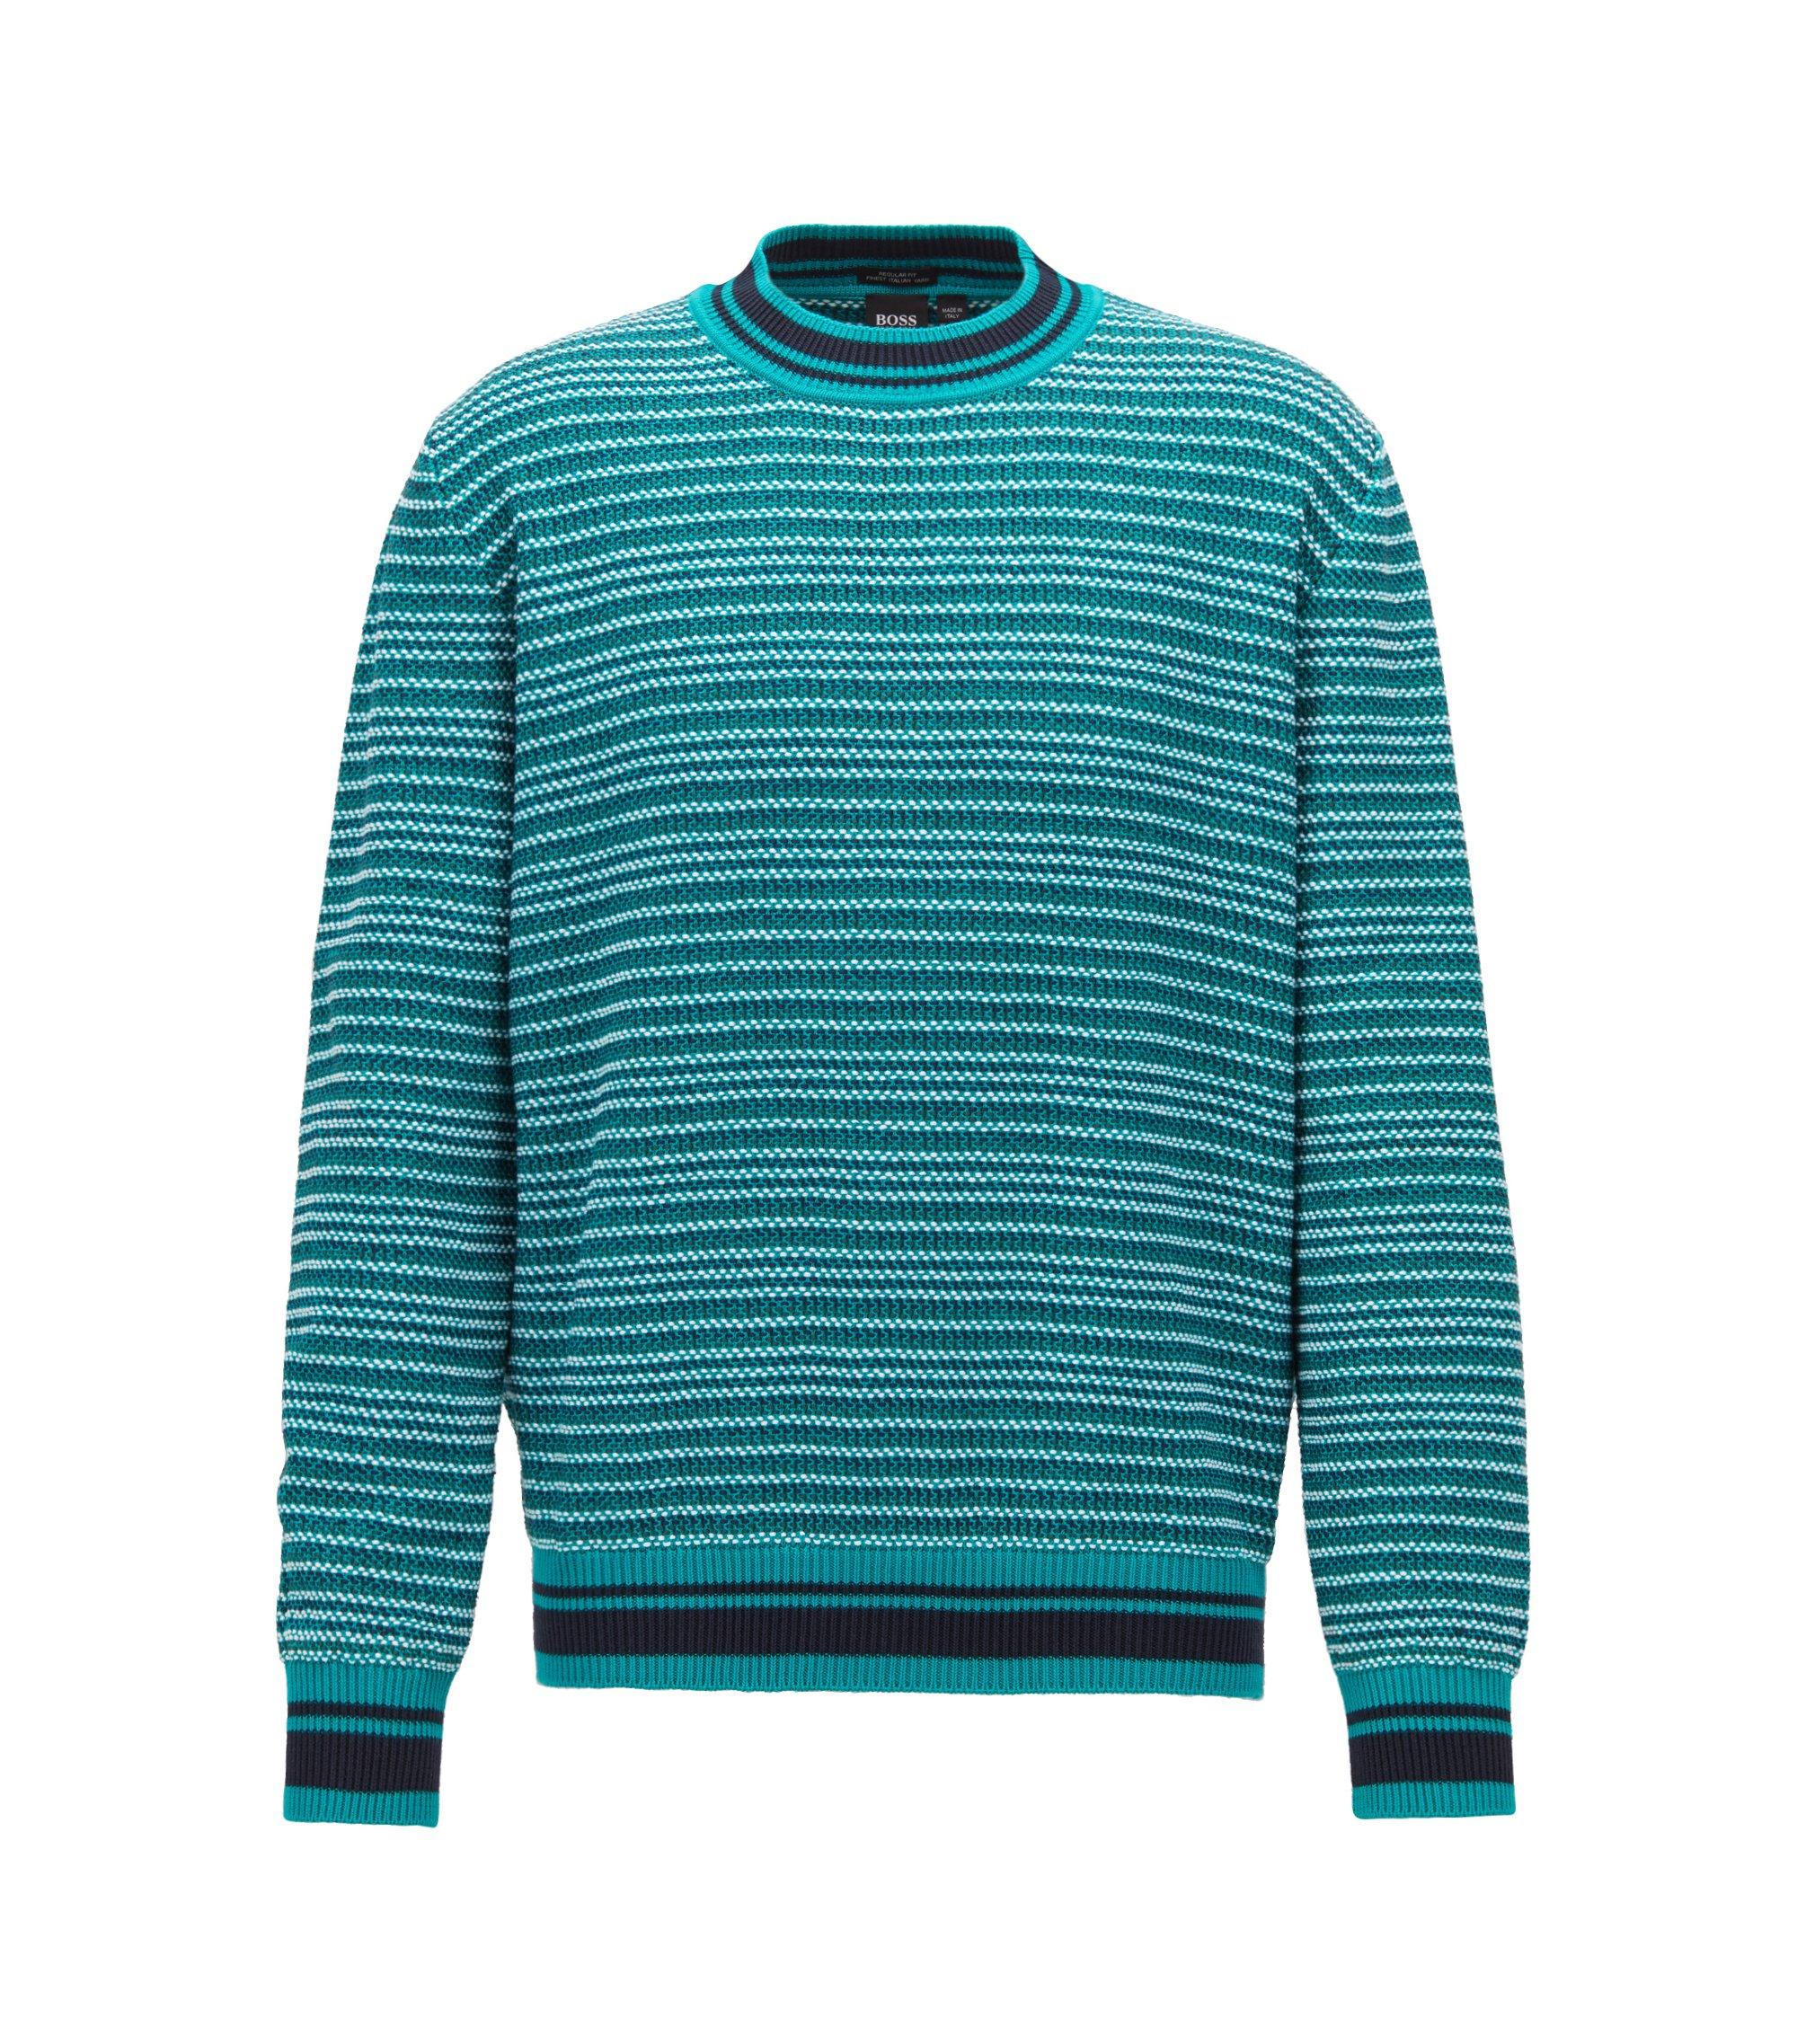 Gestreifter Pullover aus strukturiertem Baumwoll-Jacquard, Grün